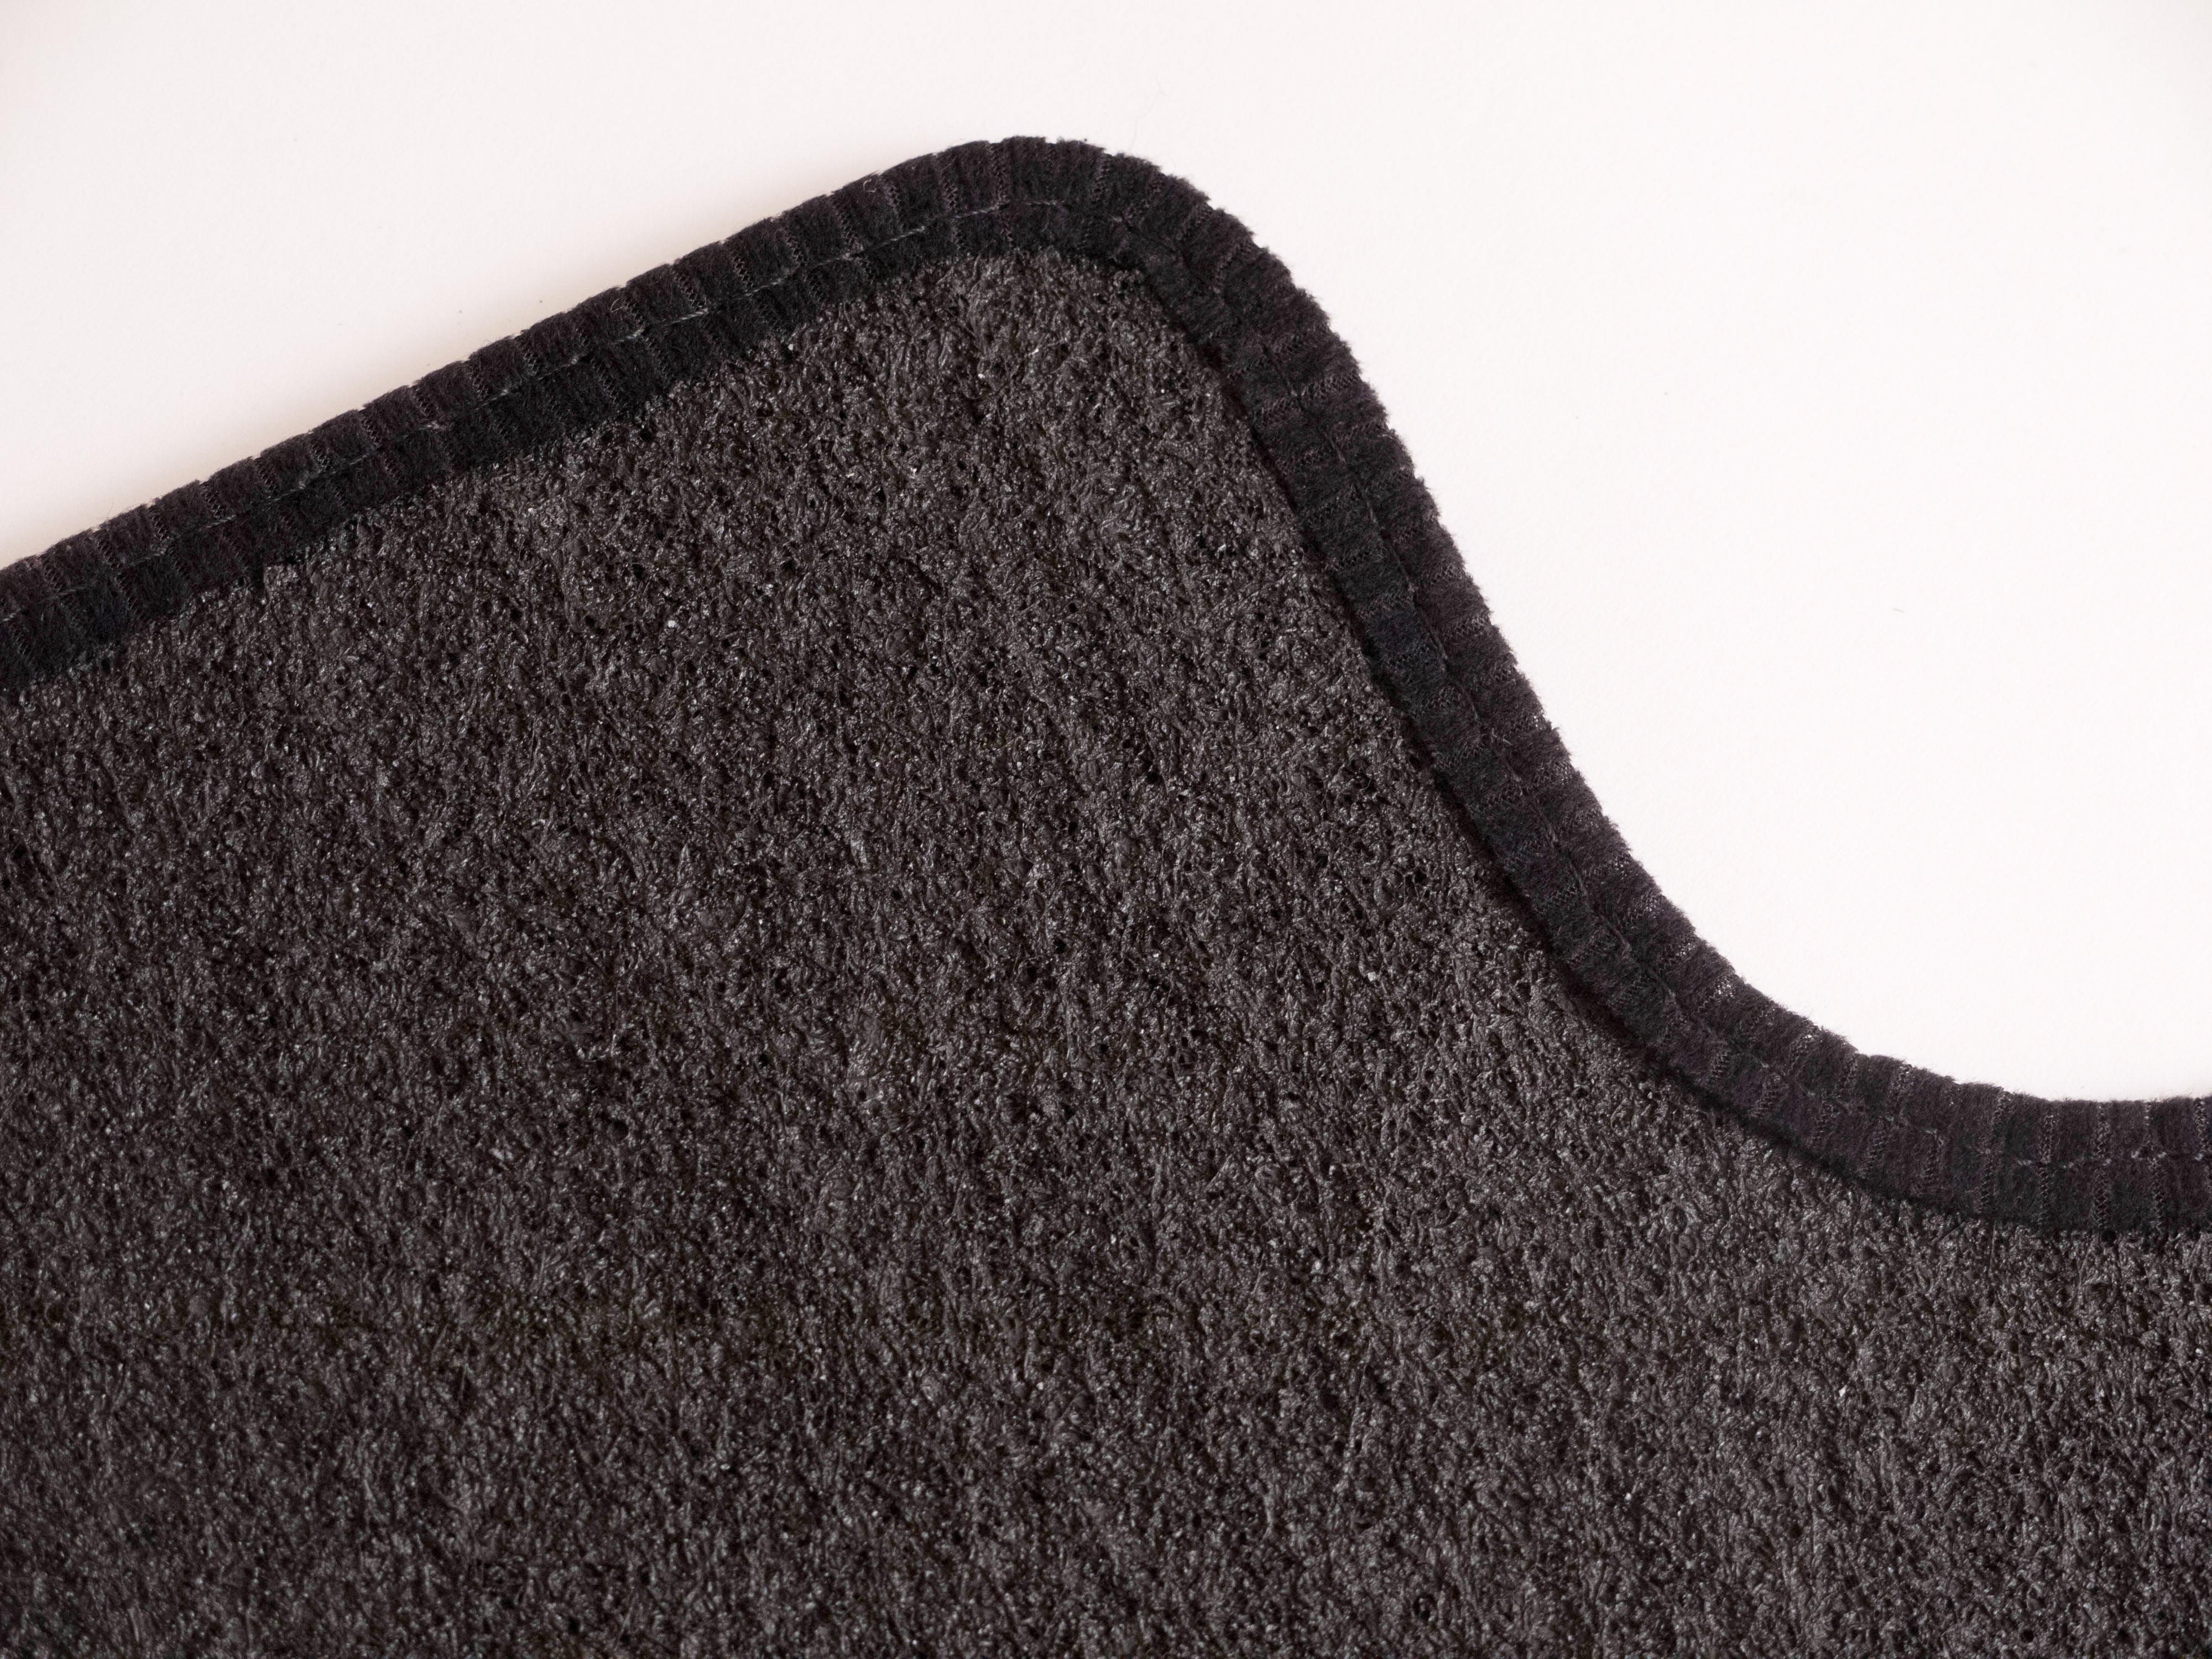 Floor mats mercedes - Sentinel Tailored Fit 3pc Black Carpet Floor Mat Set For Mercedes Vito Dualiner 06 12